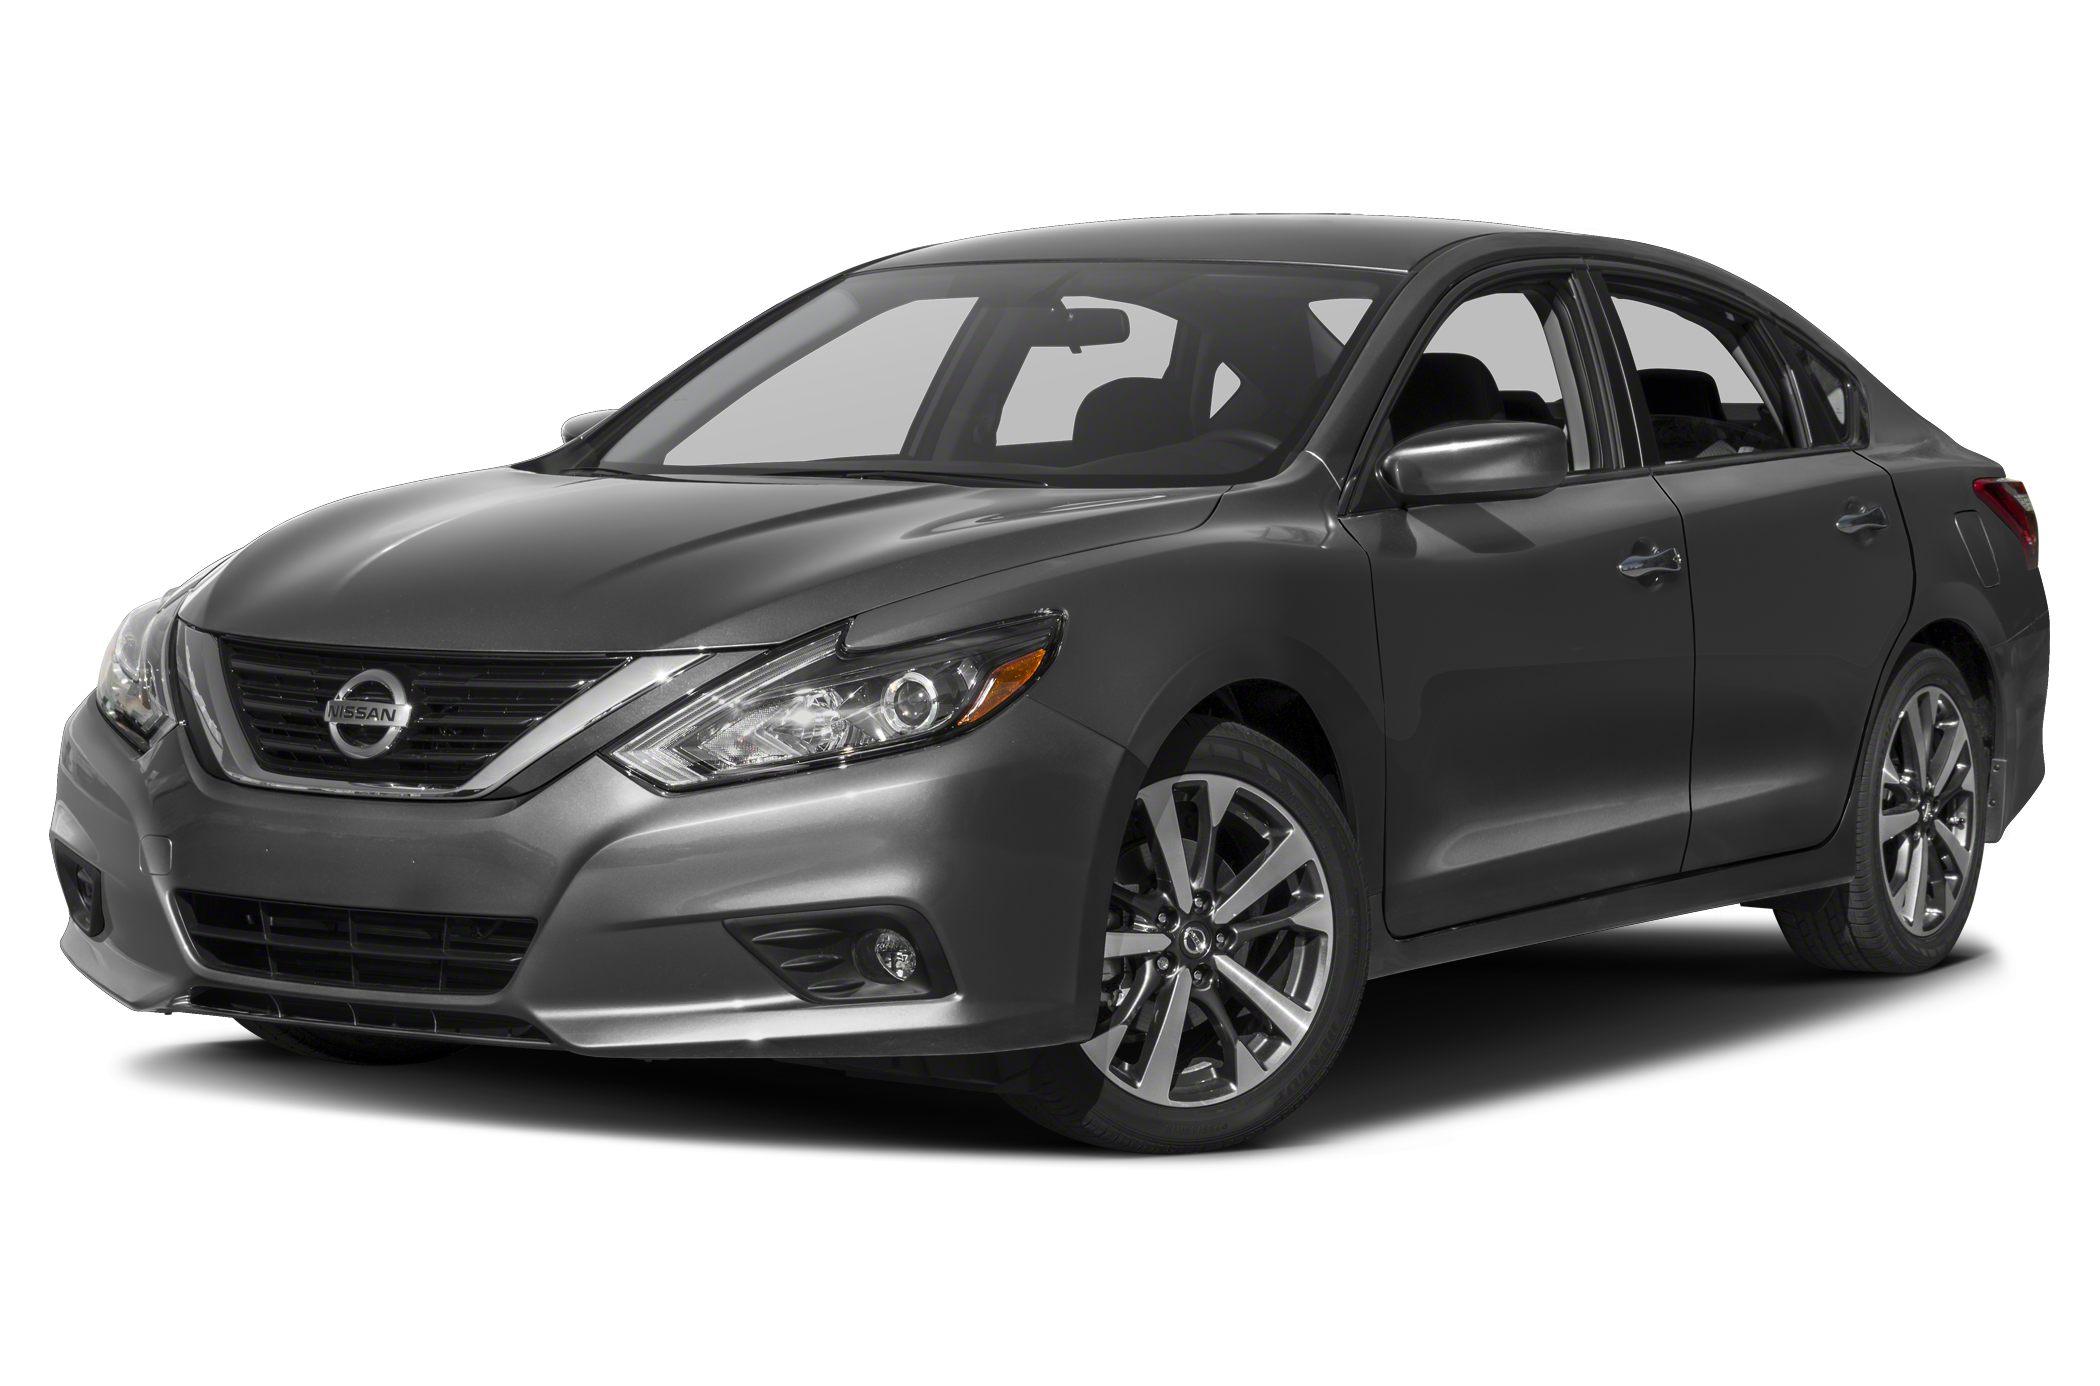 2017 Nissan Altima Reviews Specs And Prices Cars Com